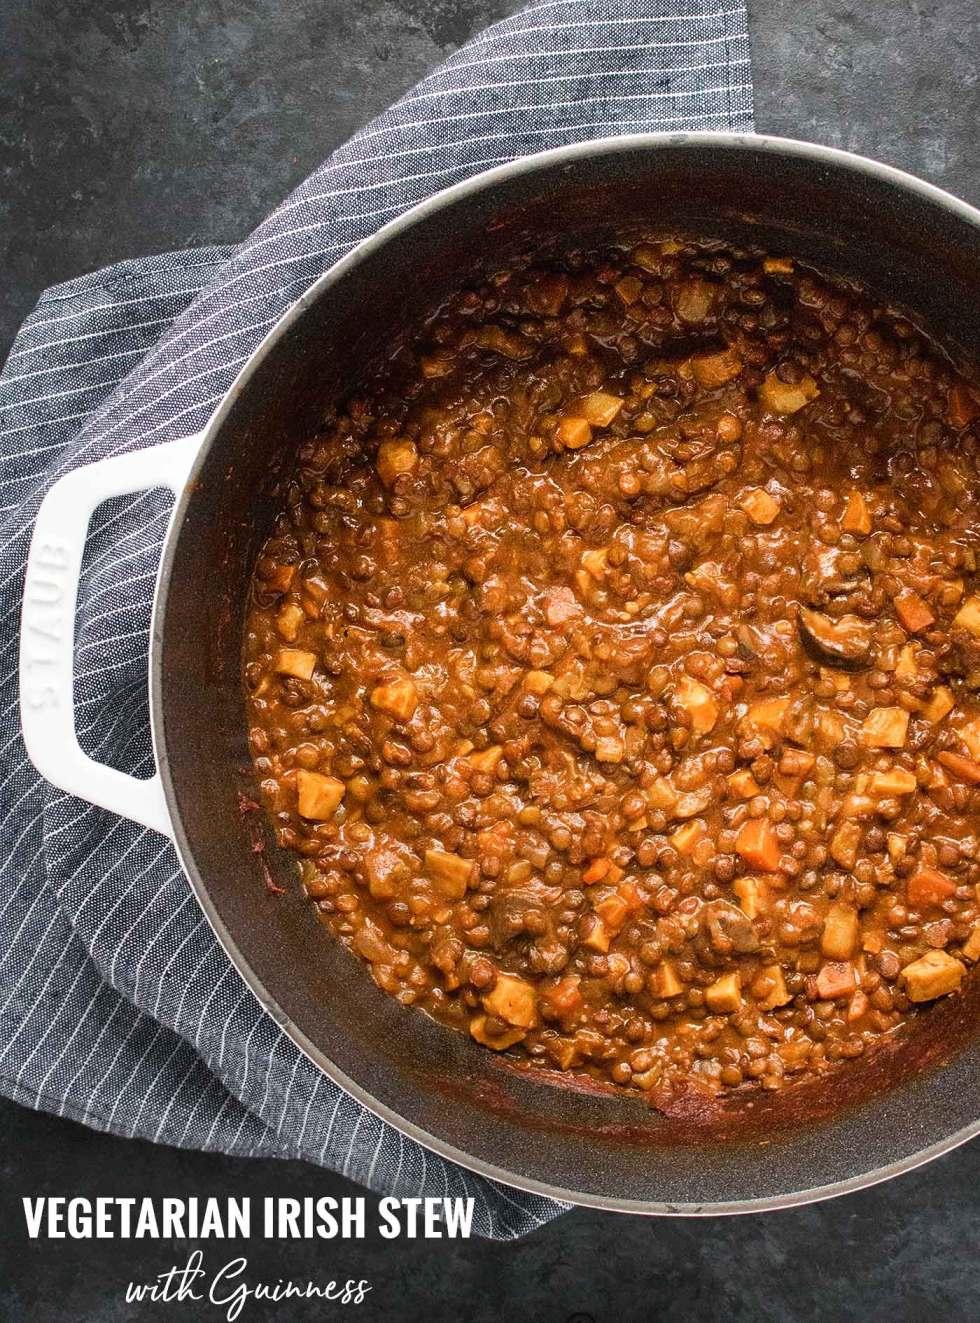 Vegetarian Irish Stew for Lentil Lovers - Recipe at SoupAddict.com